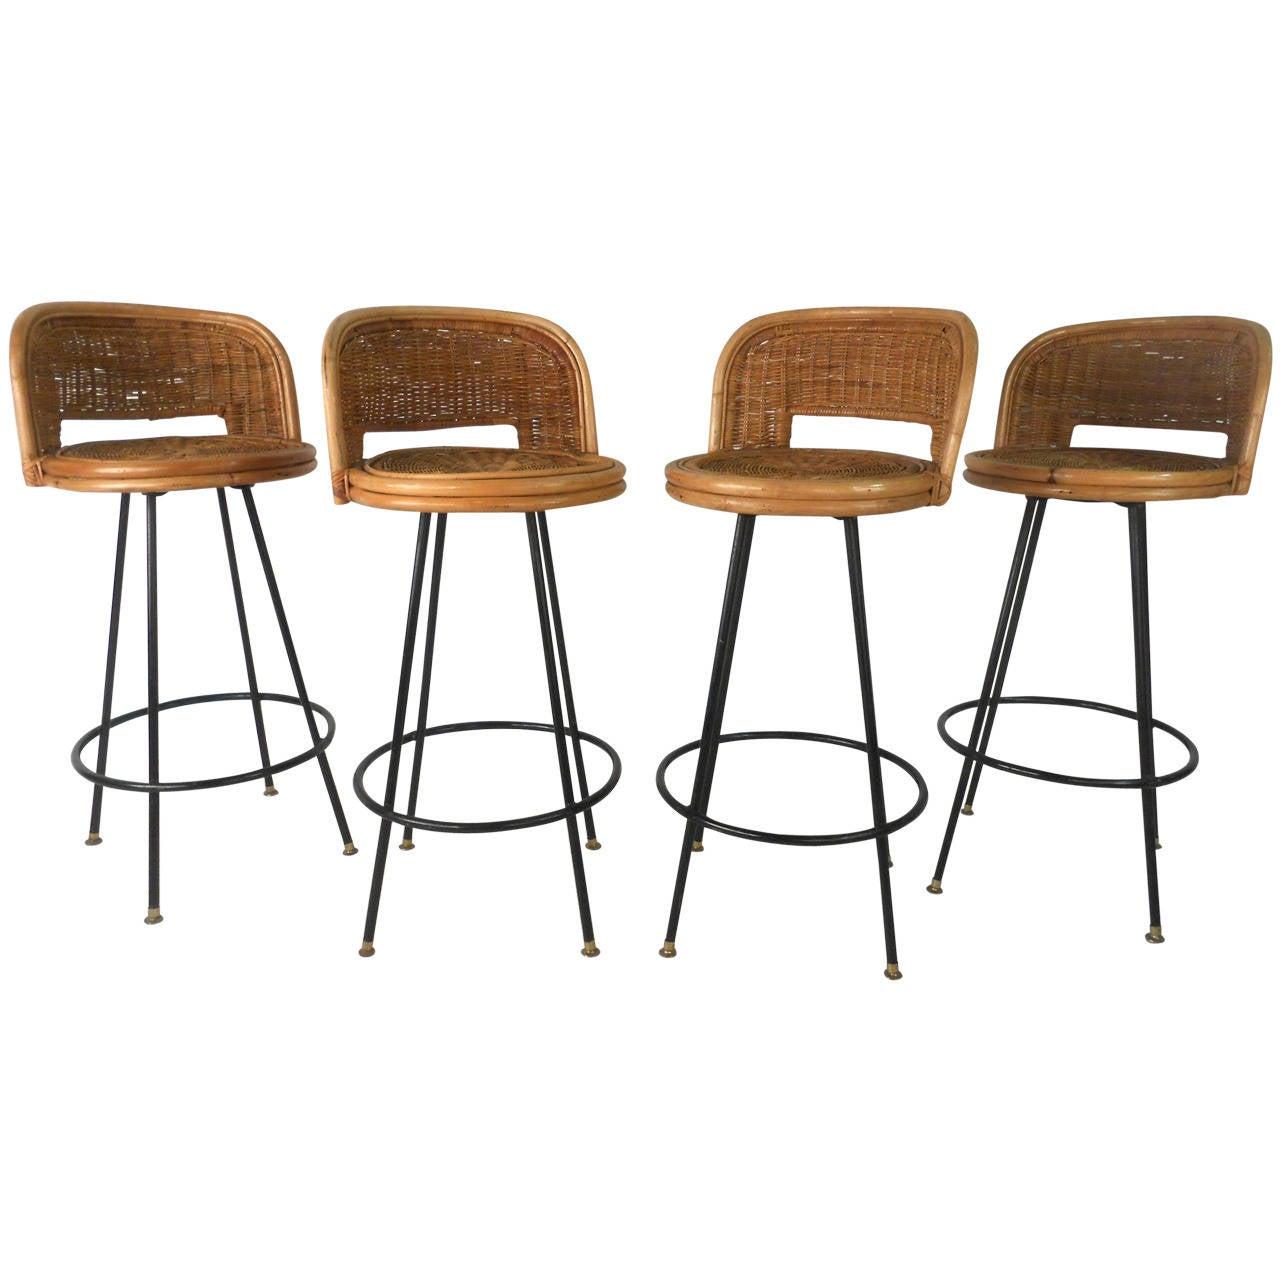 rattan bar stools